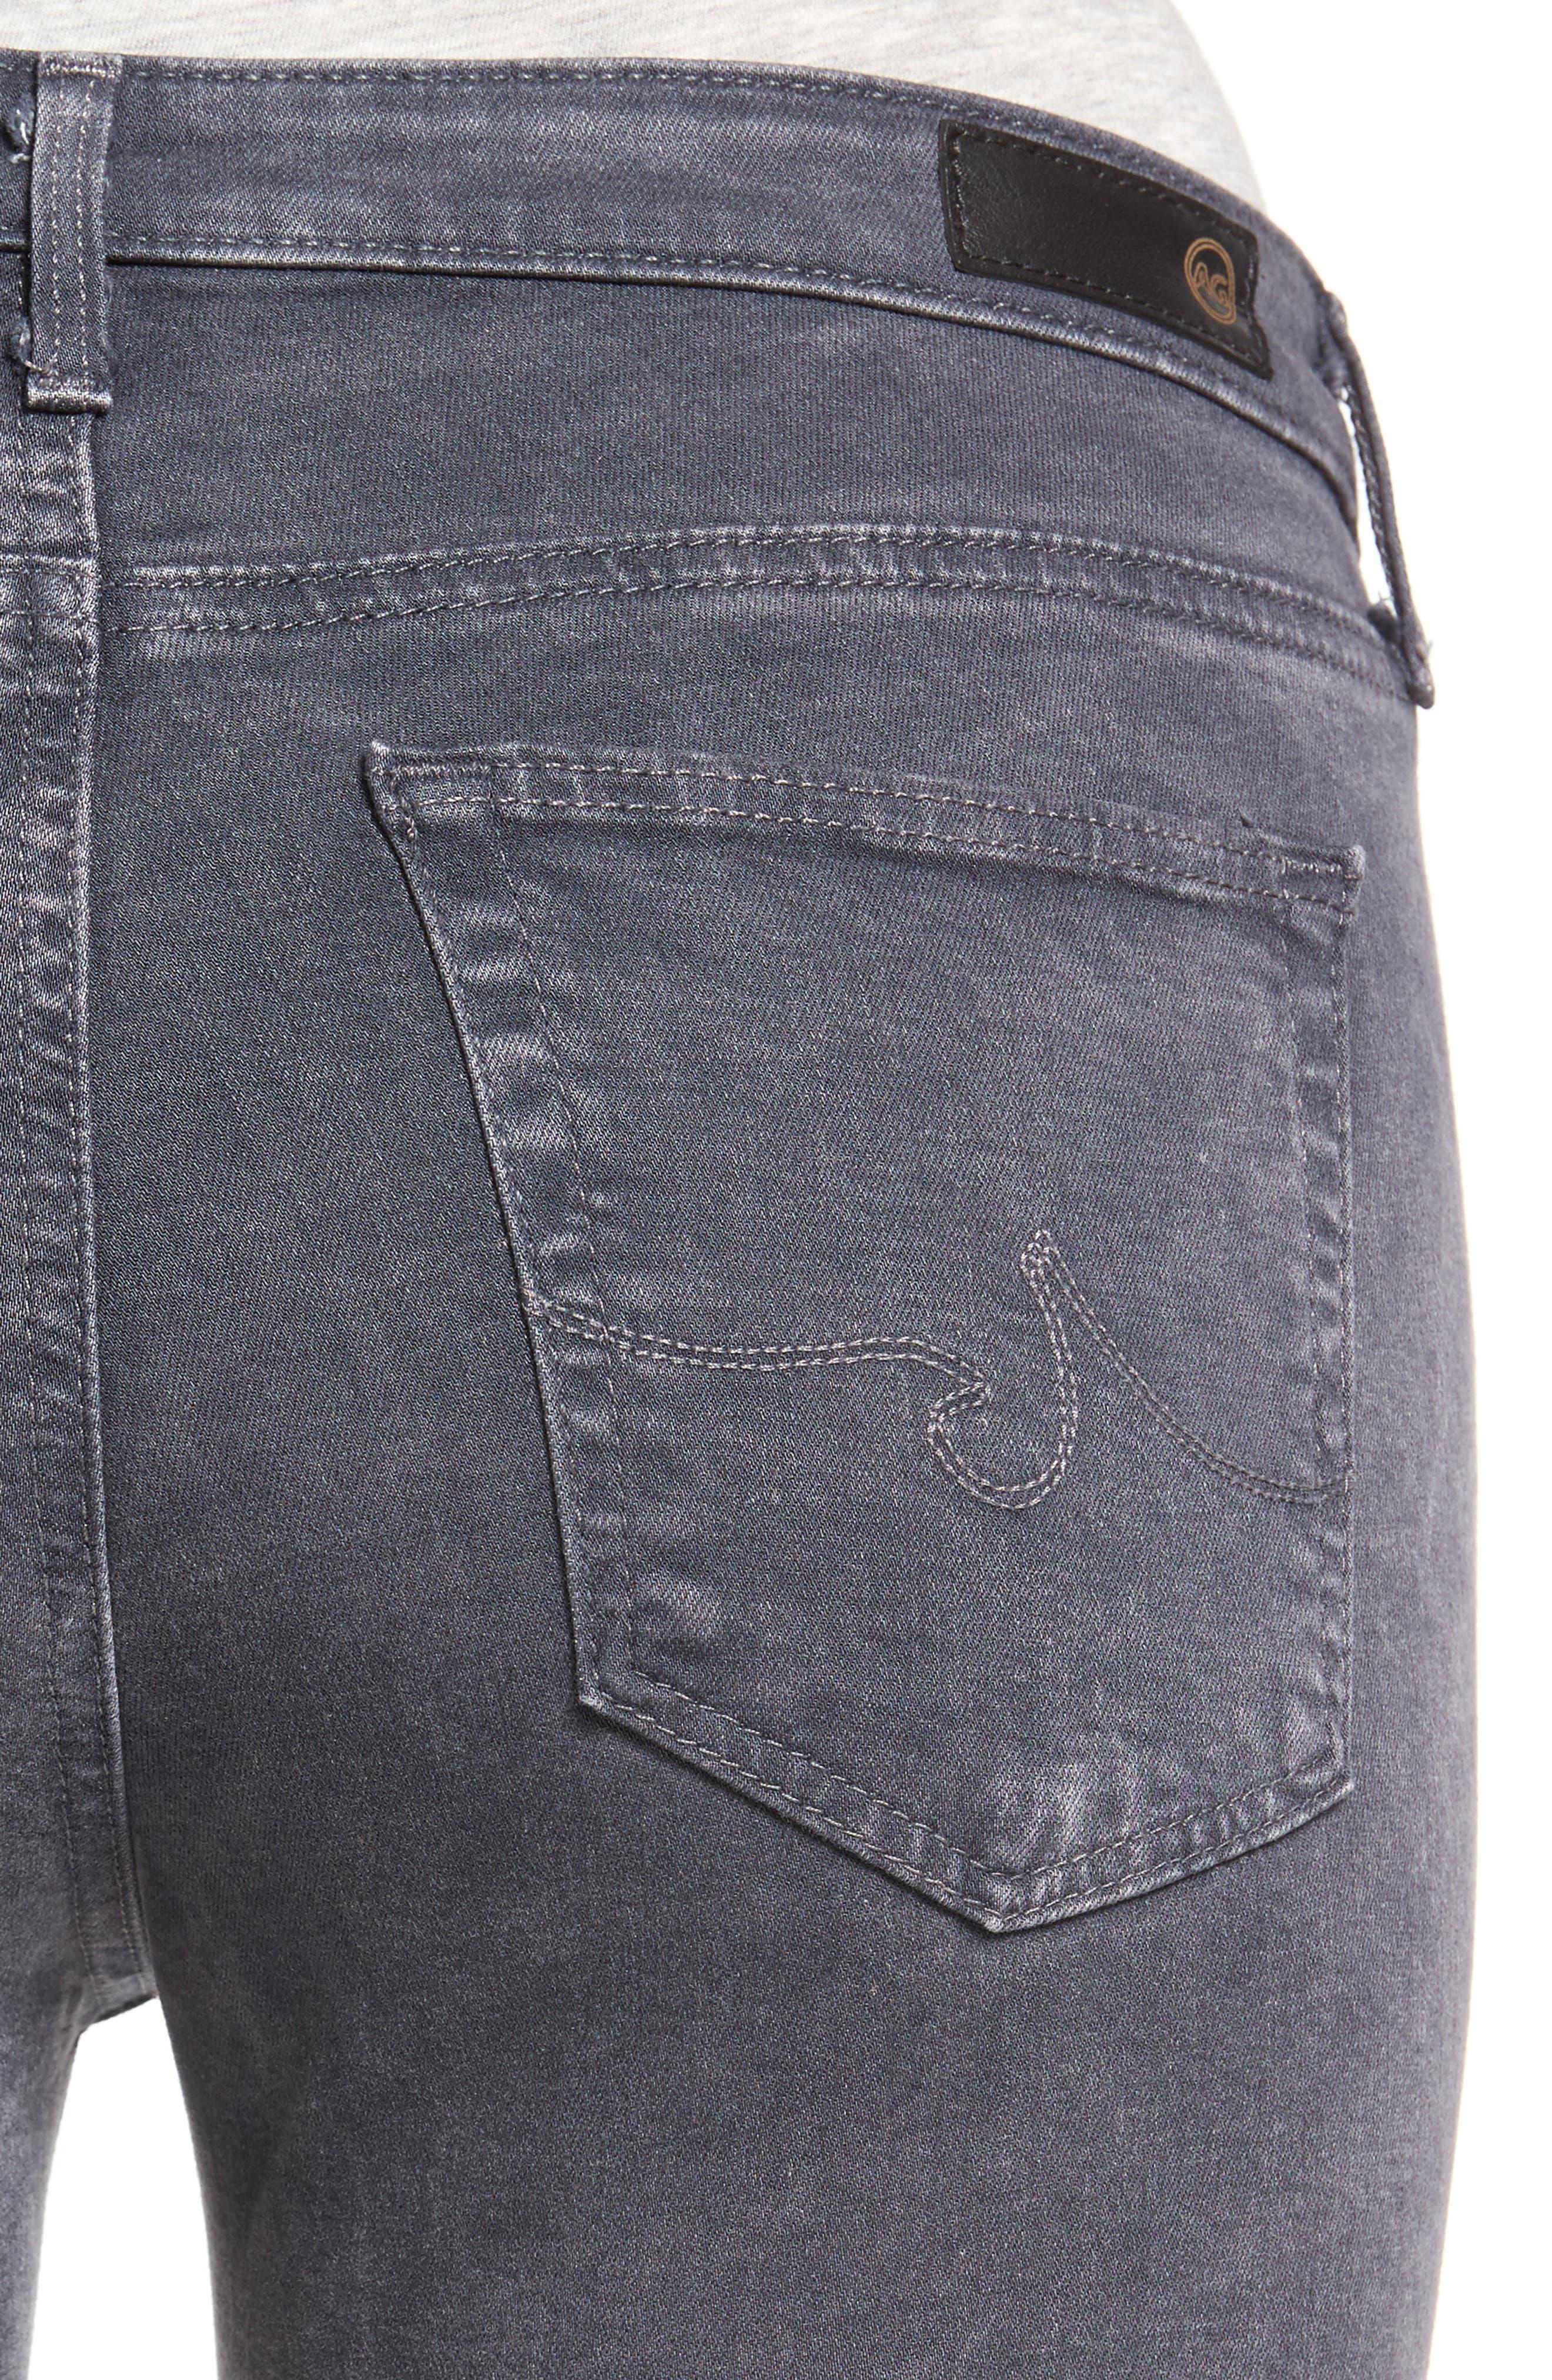 Middi Ankle Skinny Jeans,                             Alternate thumbnail 4, color,                             Erosion